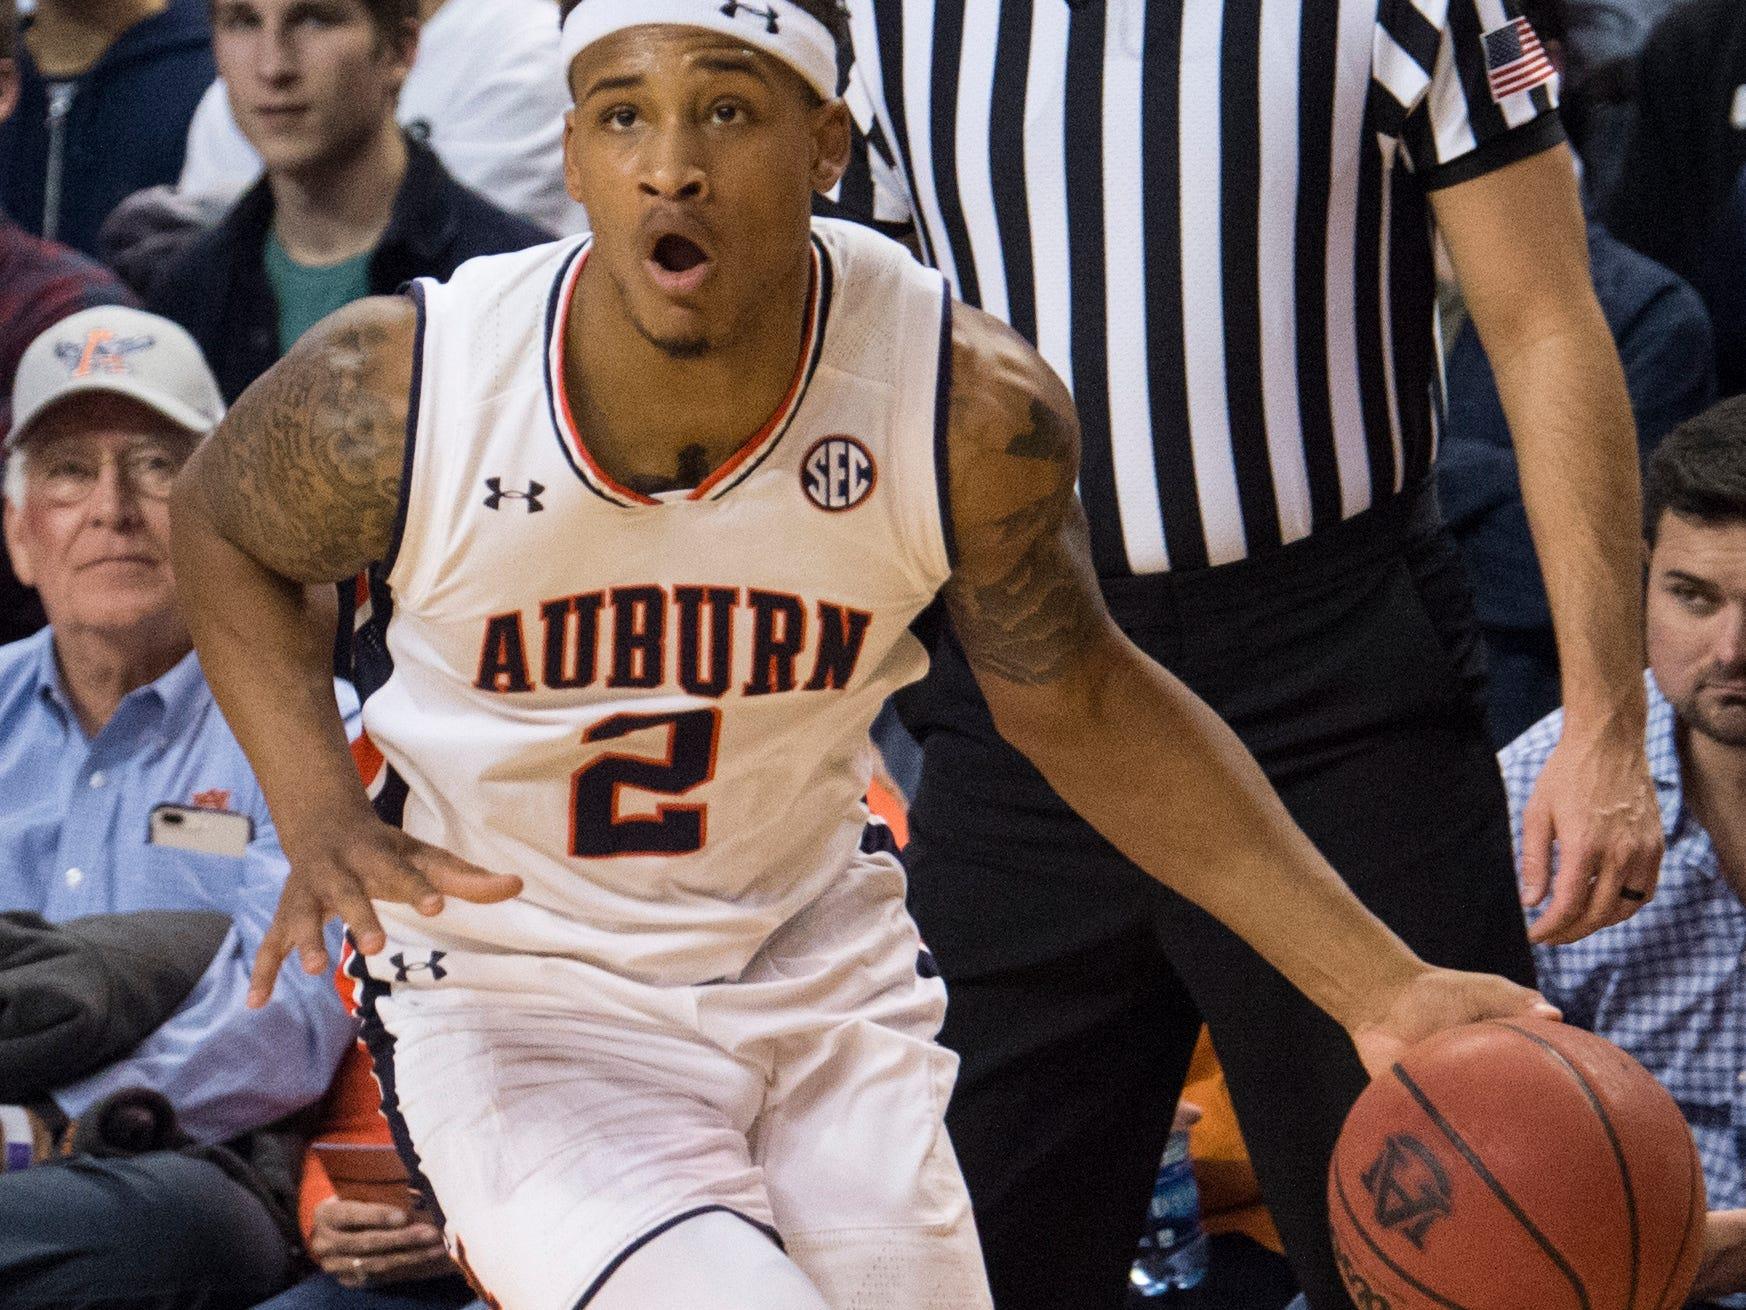 Auburn guard Bryce Brown (2) drives to the baseline at Auburn Arena in Auburn, Ala., on Wednesday, Nov. 28, 2018. Auburn defeated Saint Peter's 99-49.